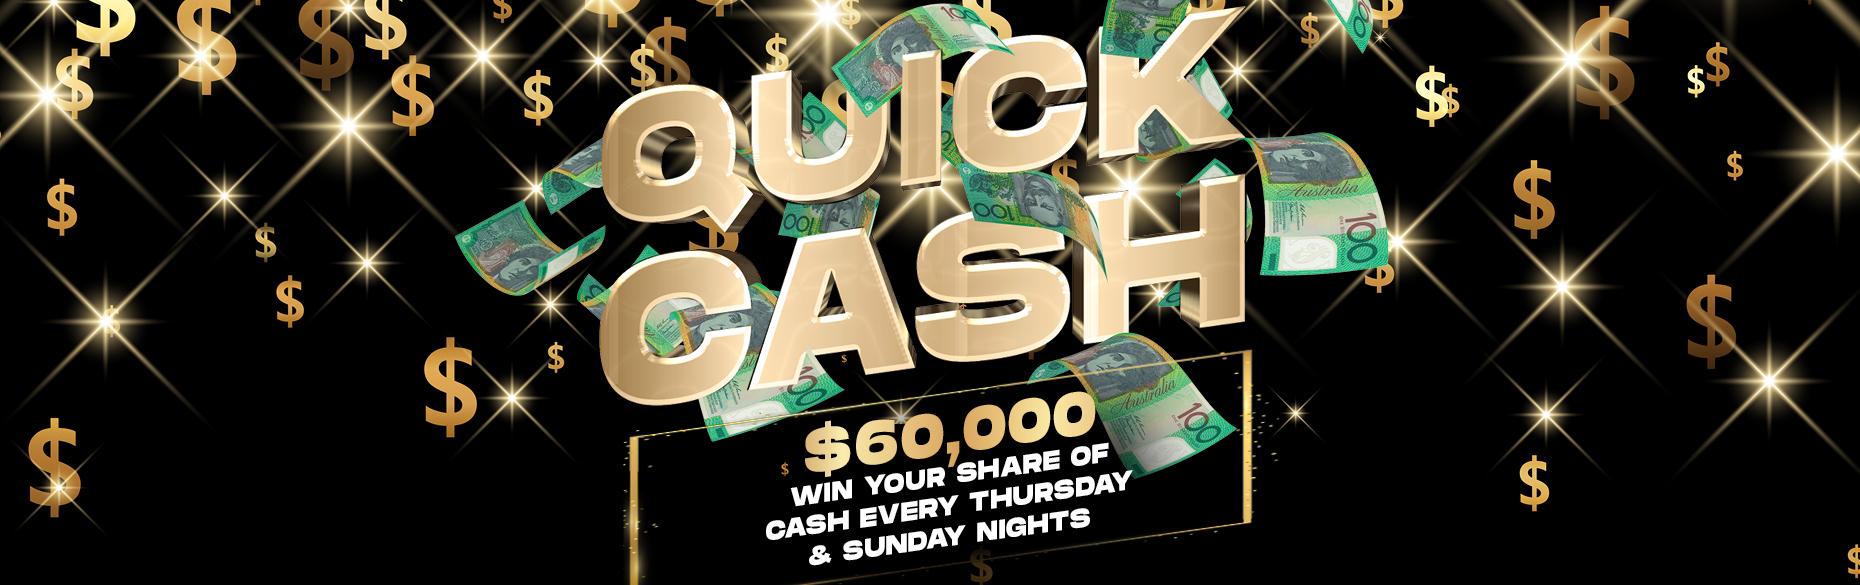 NRSL_Quick-Cash_Web-Banner